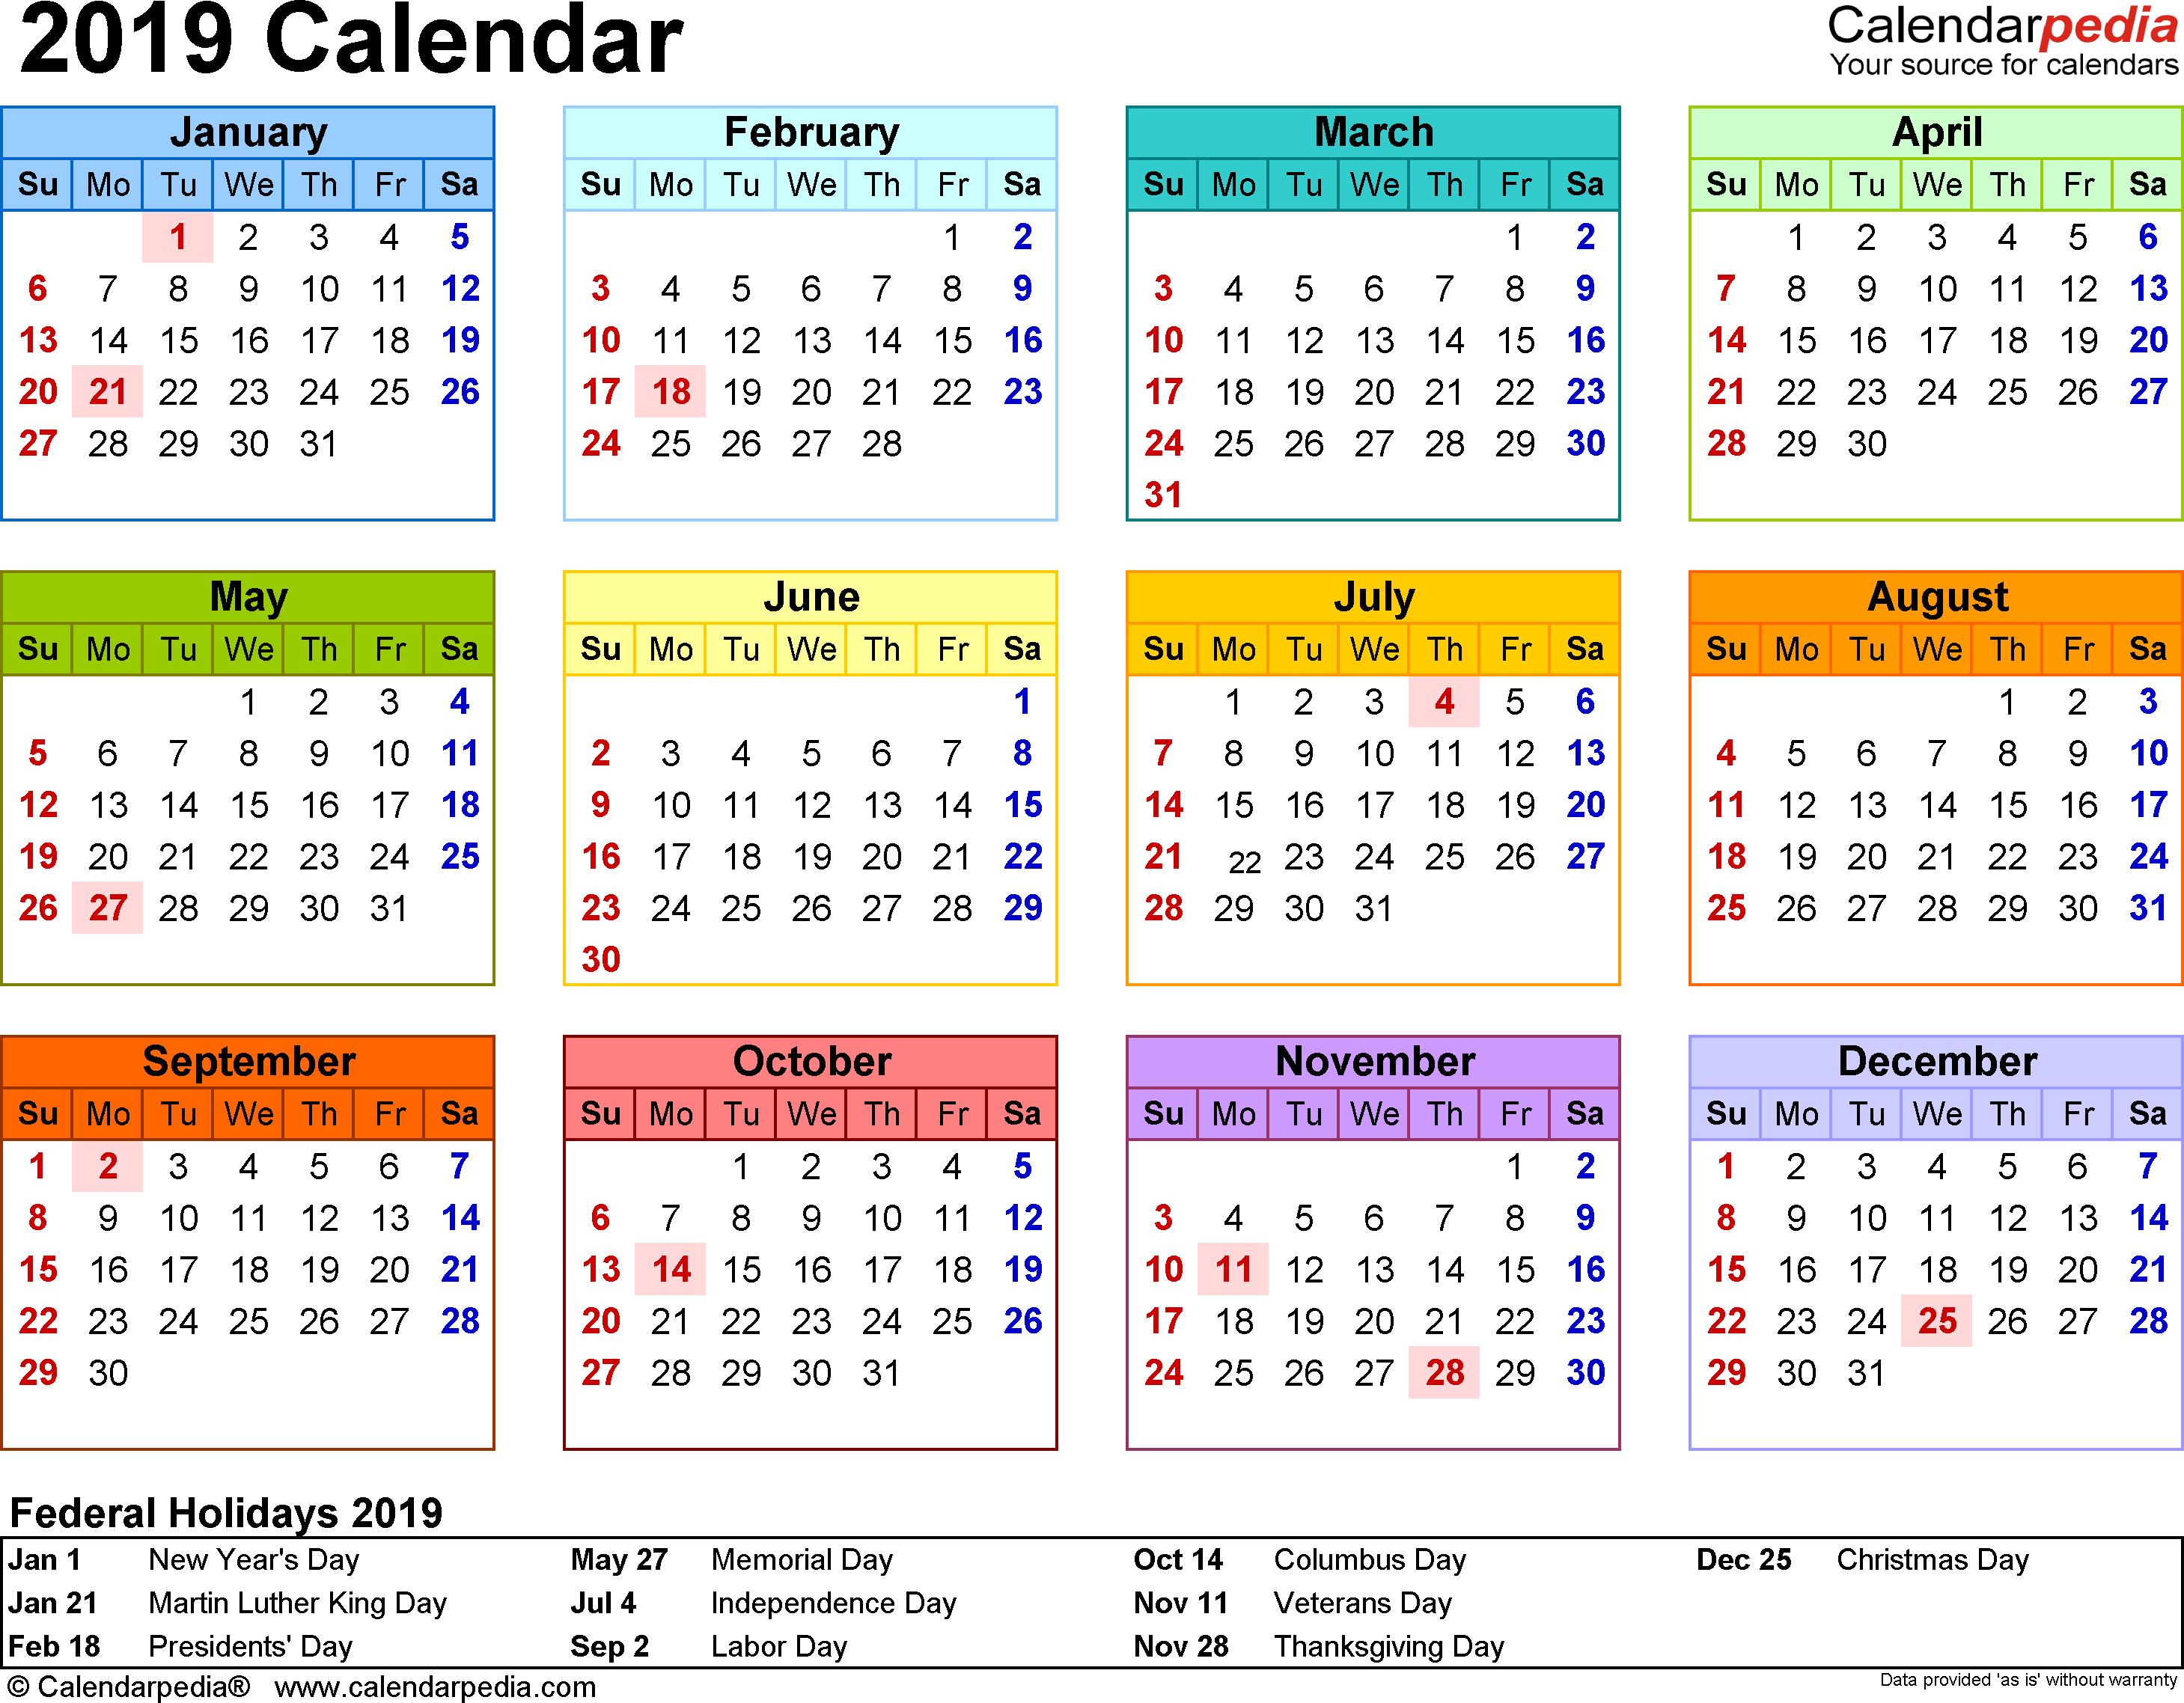 2019 Calendar Pdf - 18 Free Printable Calendar Templates